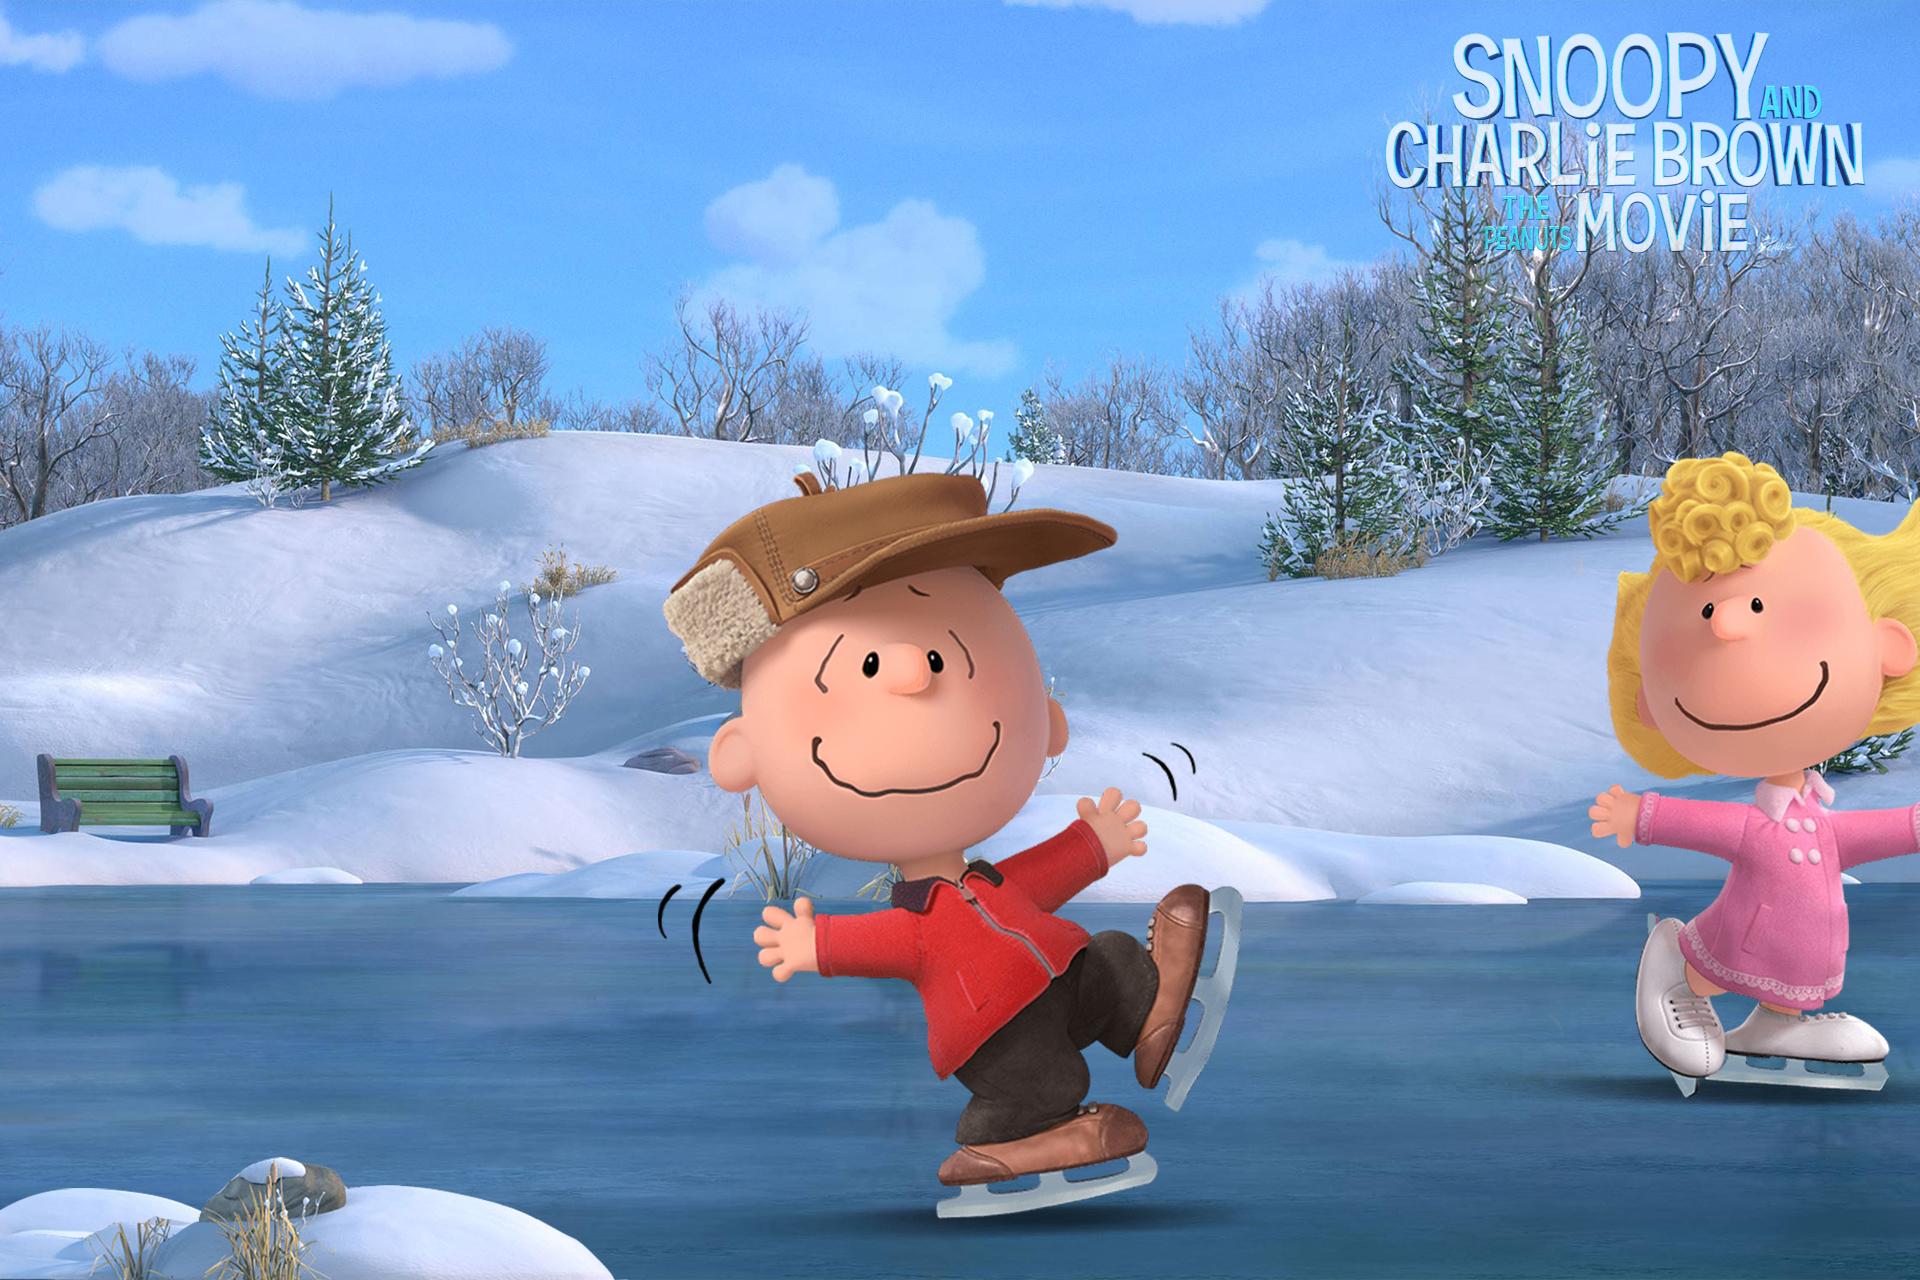 Best Wallpaper Movie Animated - the_peanuts_movie_HD_wallpaper_22  2018_467382.jpg